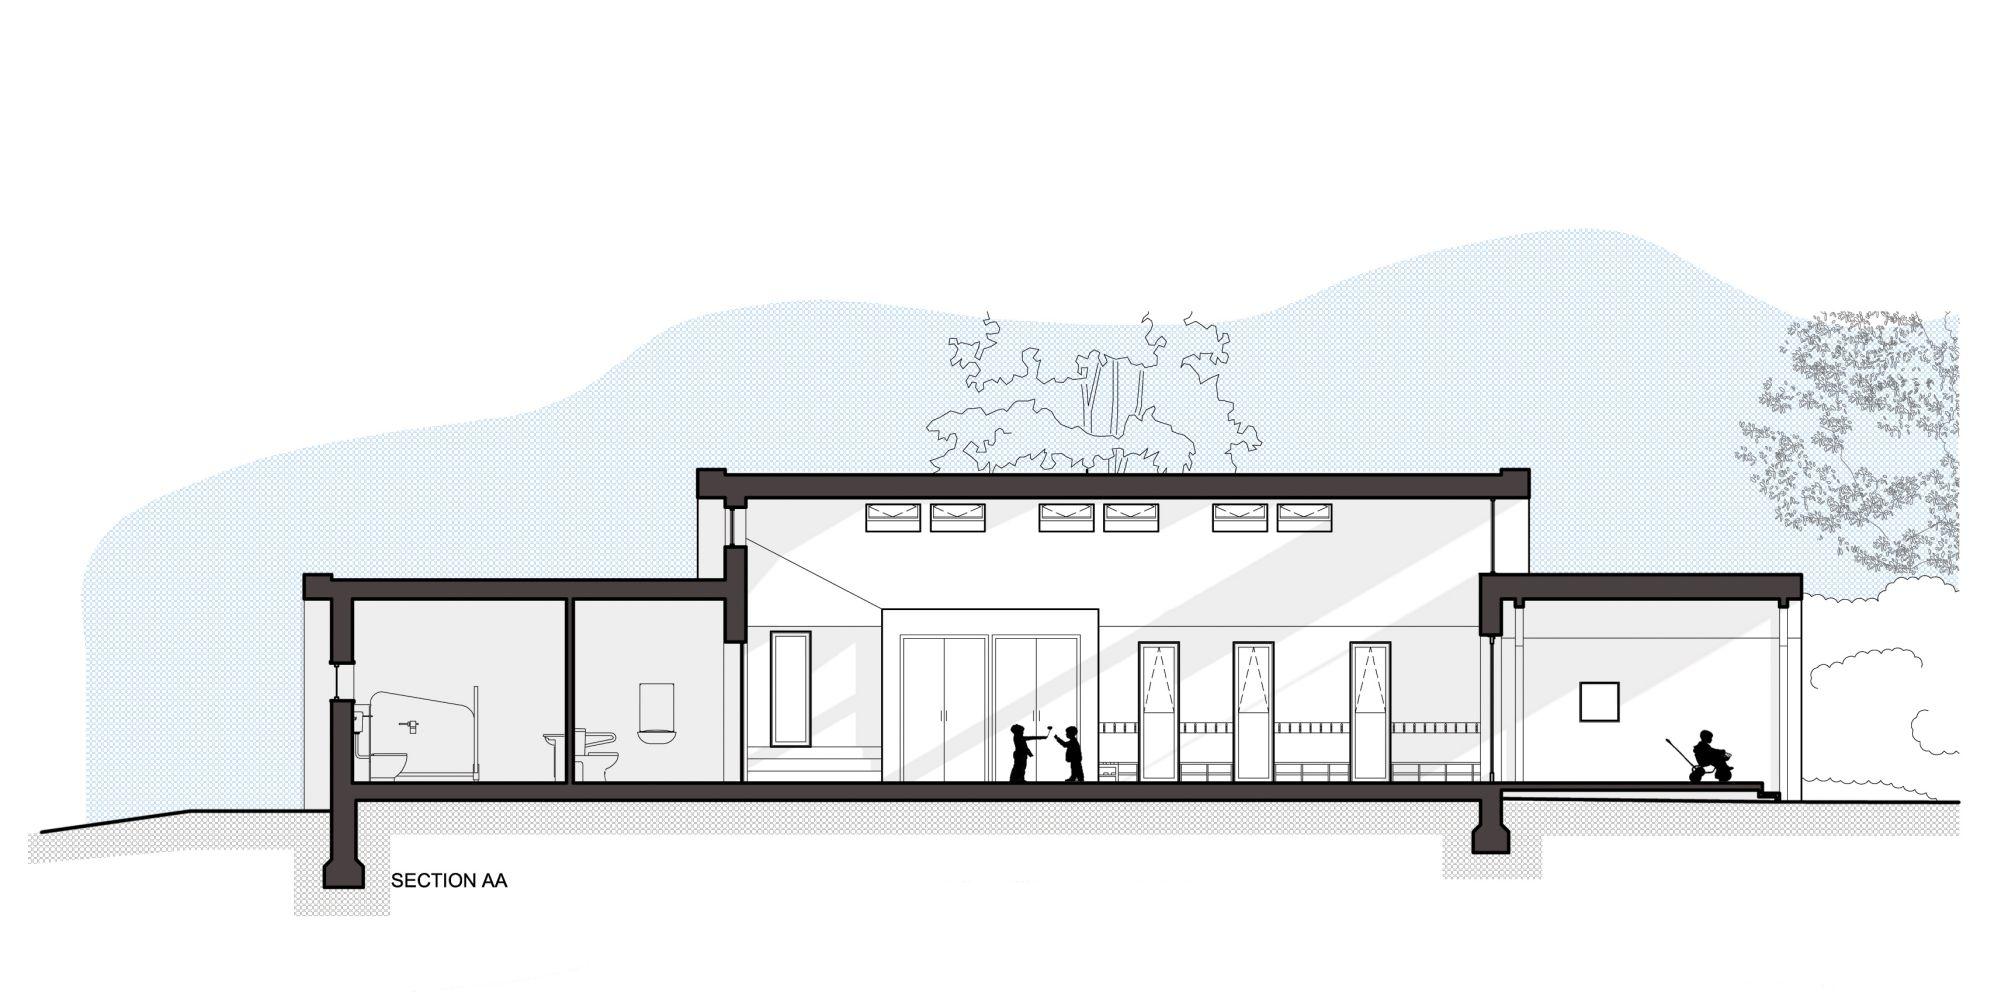 Interior design section a view plan and sketch friendly school interior design contemporary children zone